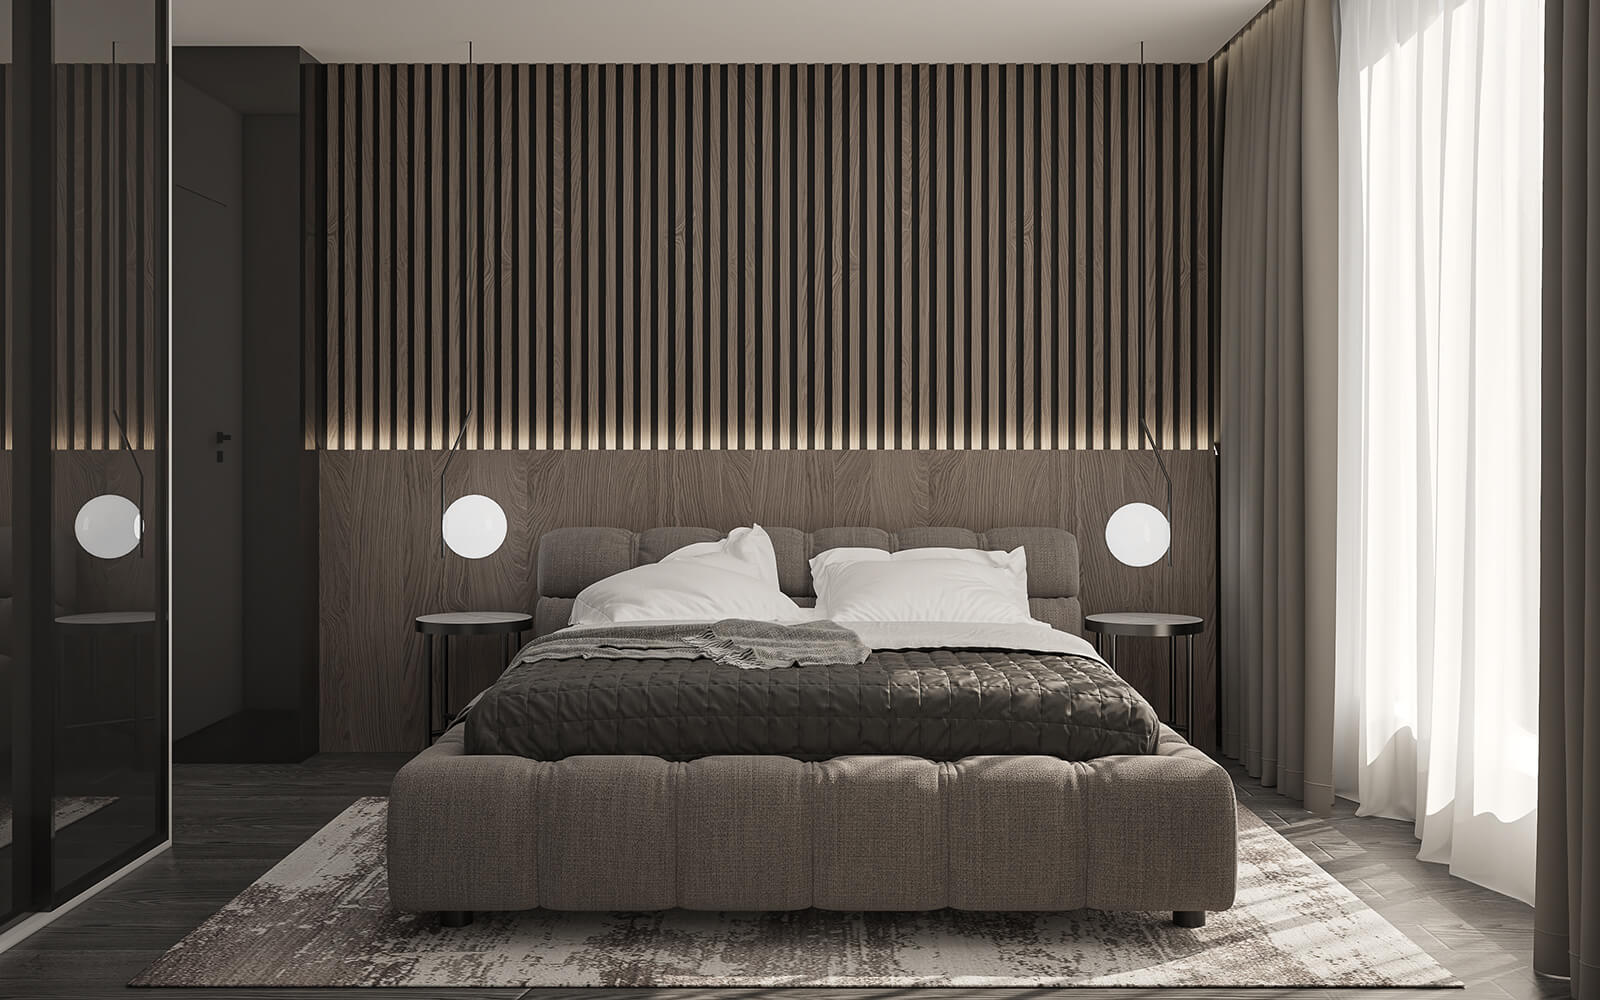 interioren-dizain-proekt-na-spalnya